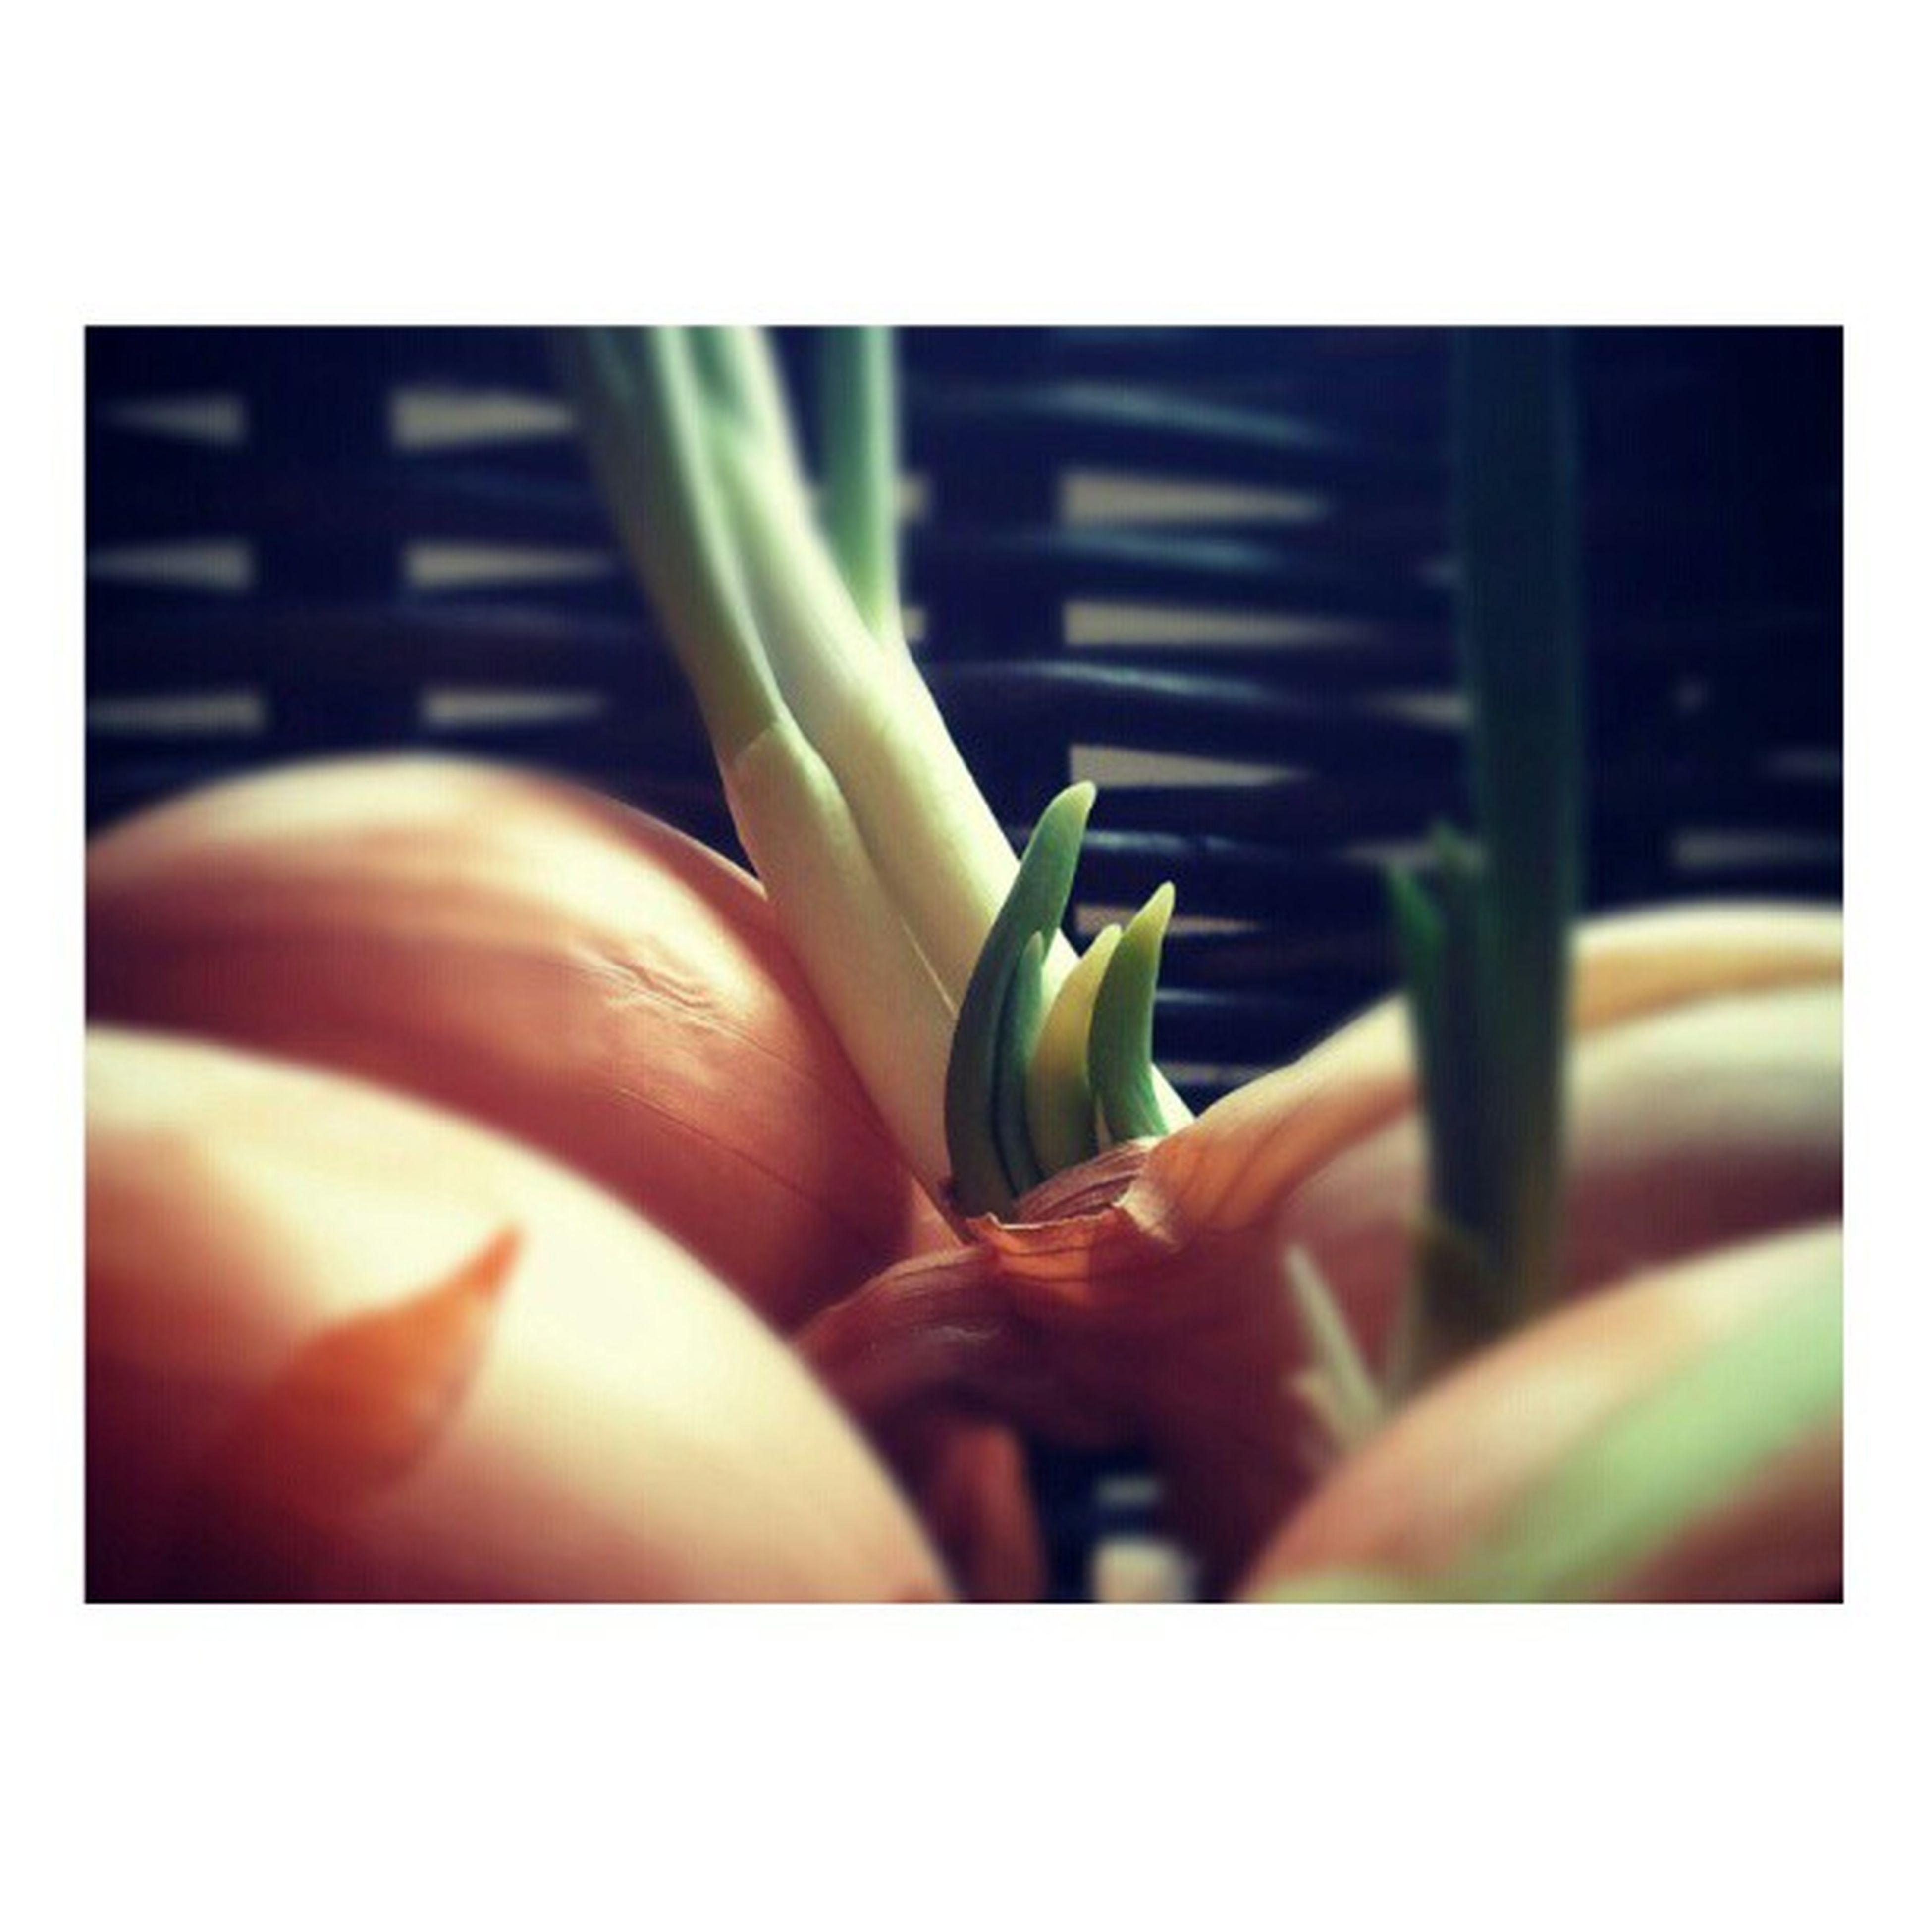 Onion Closeup Foodart Foodpics foodporn grow implus_daily ig_israel primeshots statigram instabest instashots ig_snapshots instahome inmykitchen מה_שעושים_במקום_לנקות